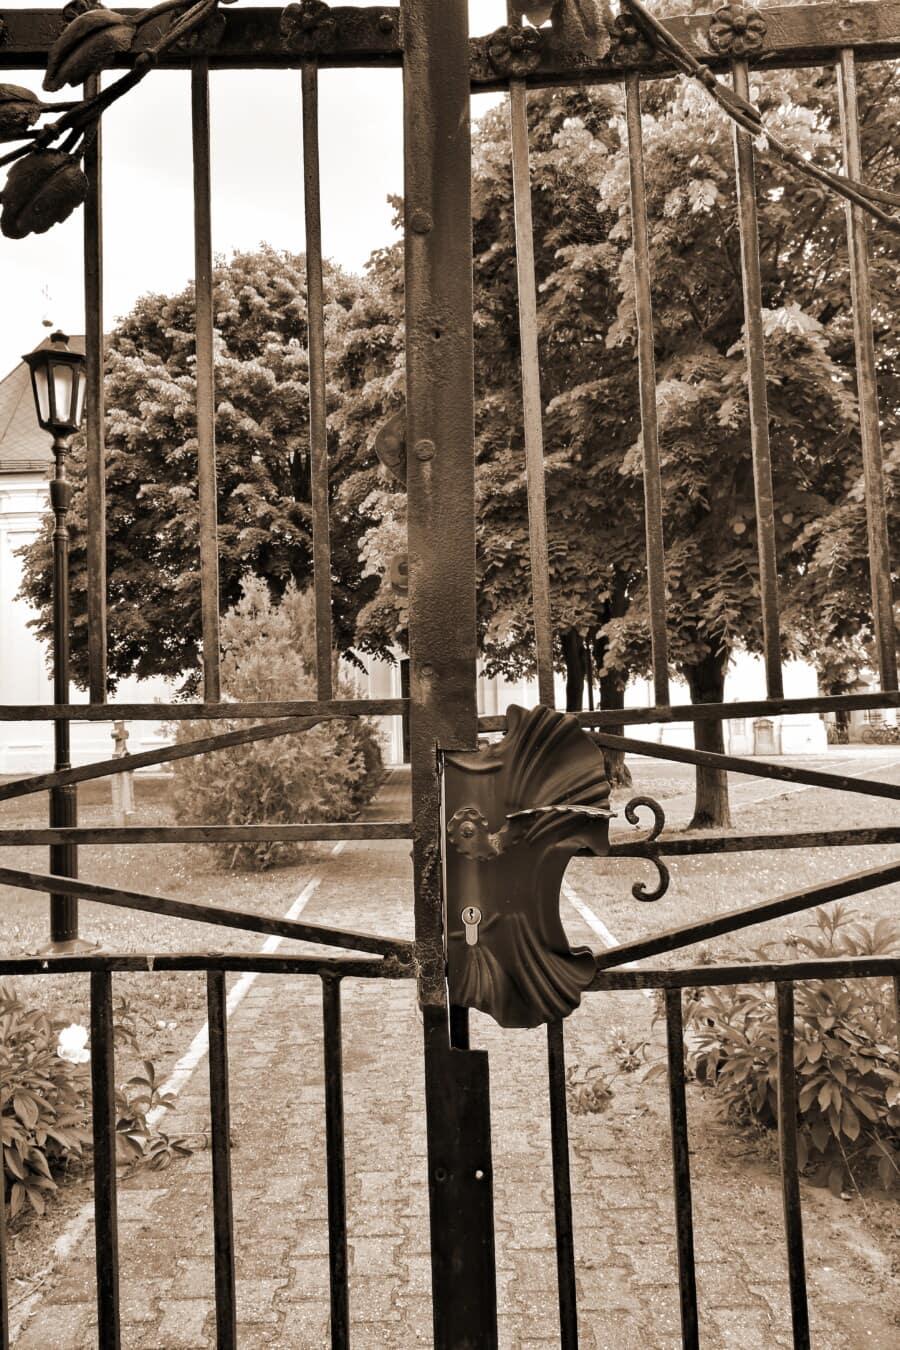 Gate, gjutjärn, Gateway, bakgård, kyrkan, Sepia, spärren, fästelementet, staket, fånga